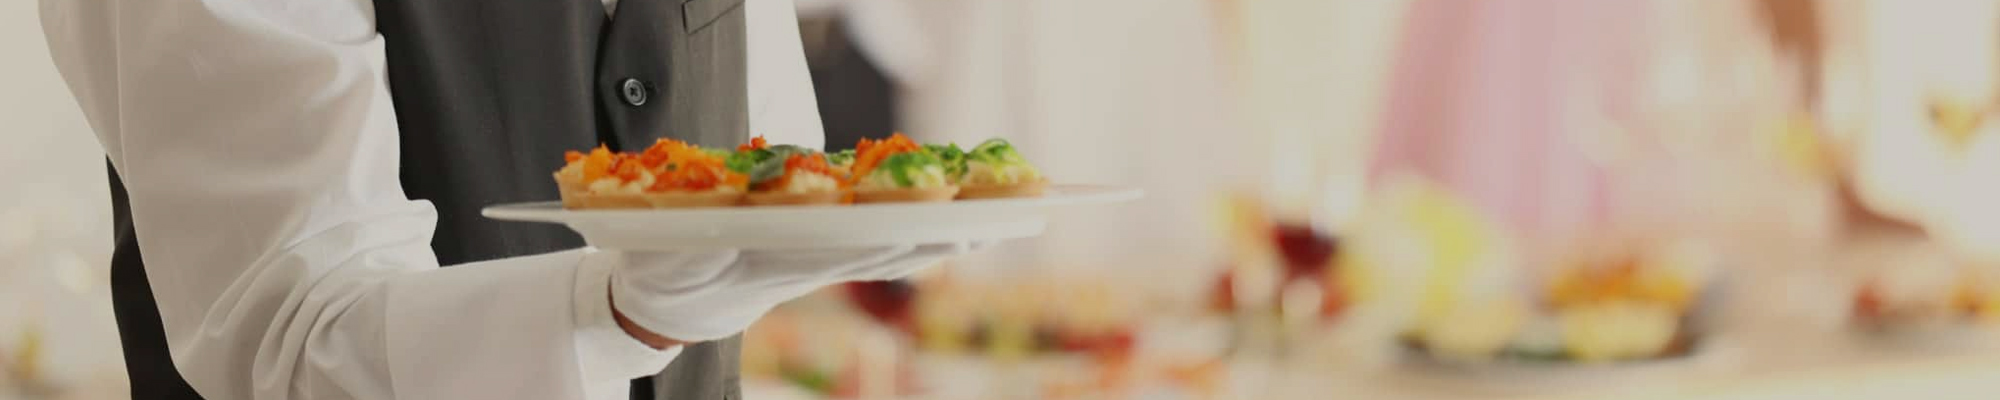 restaurant service competition apprenticeships